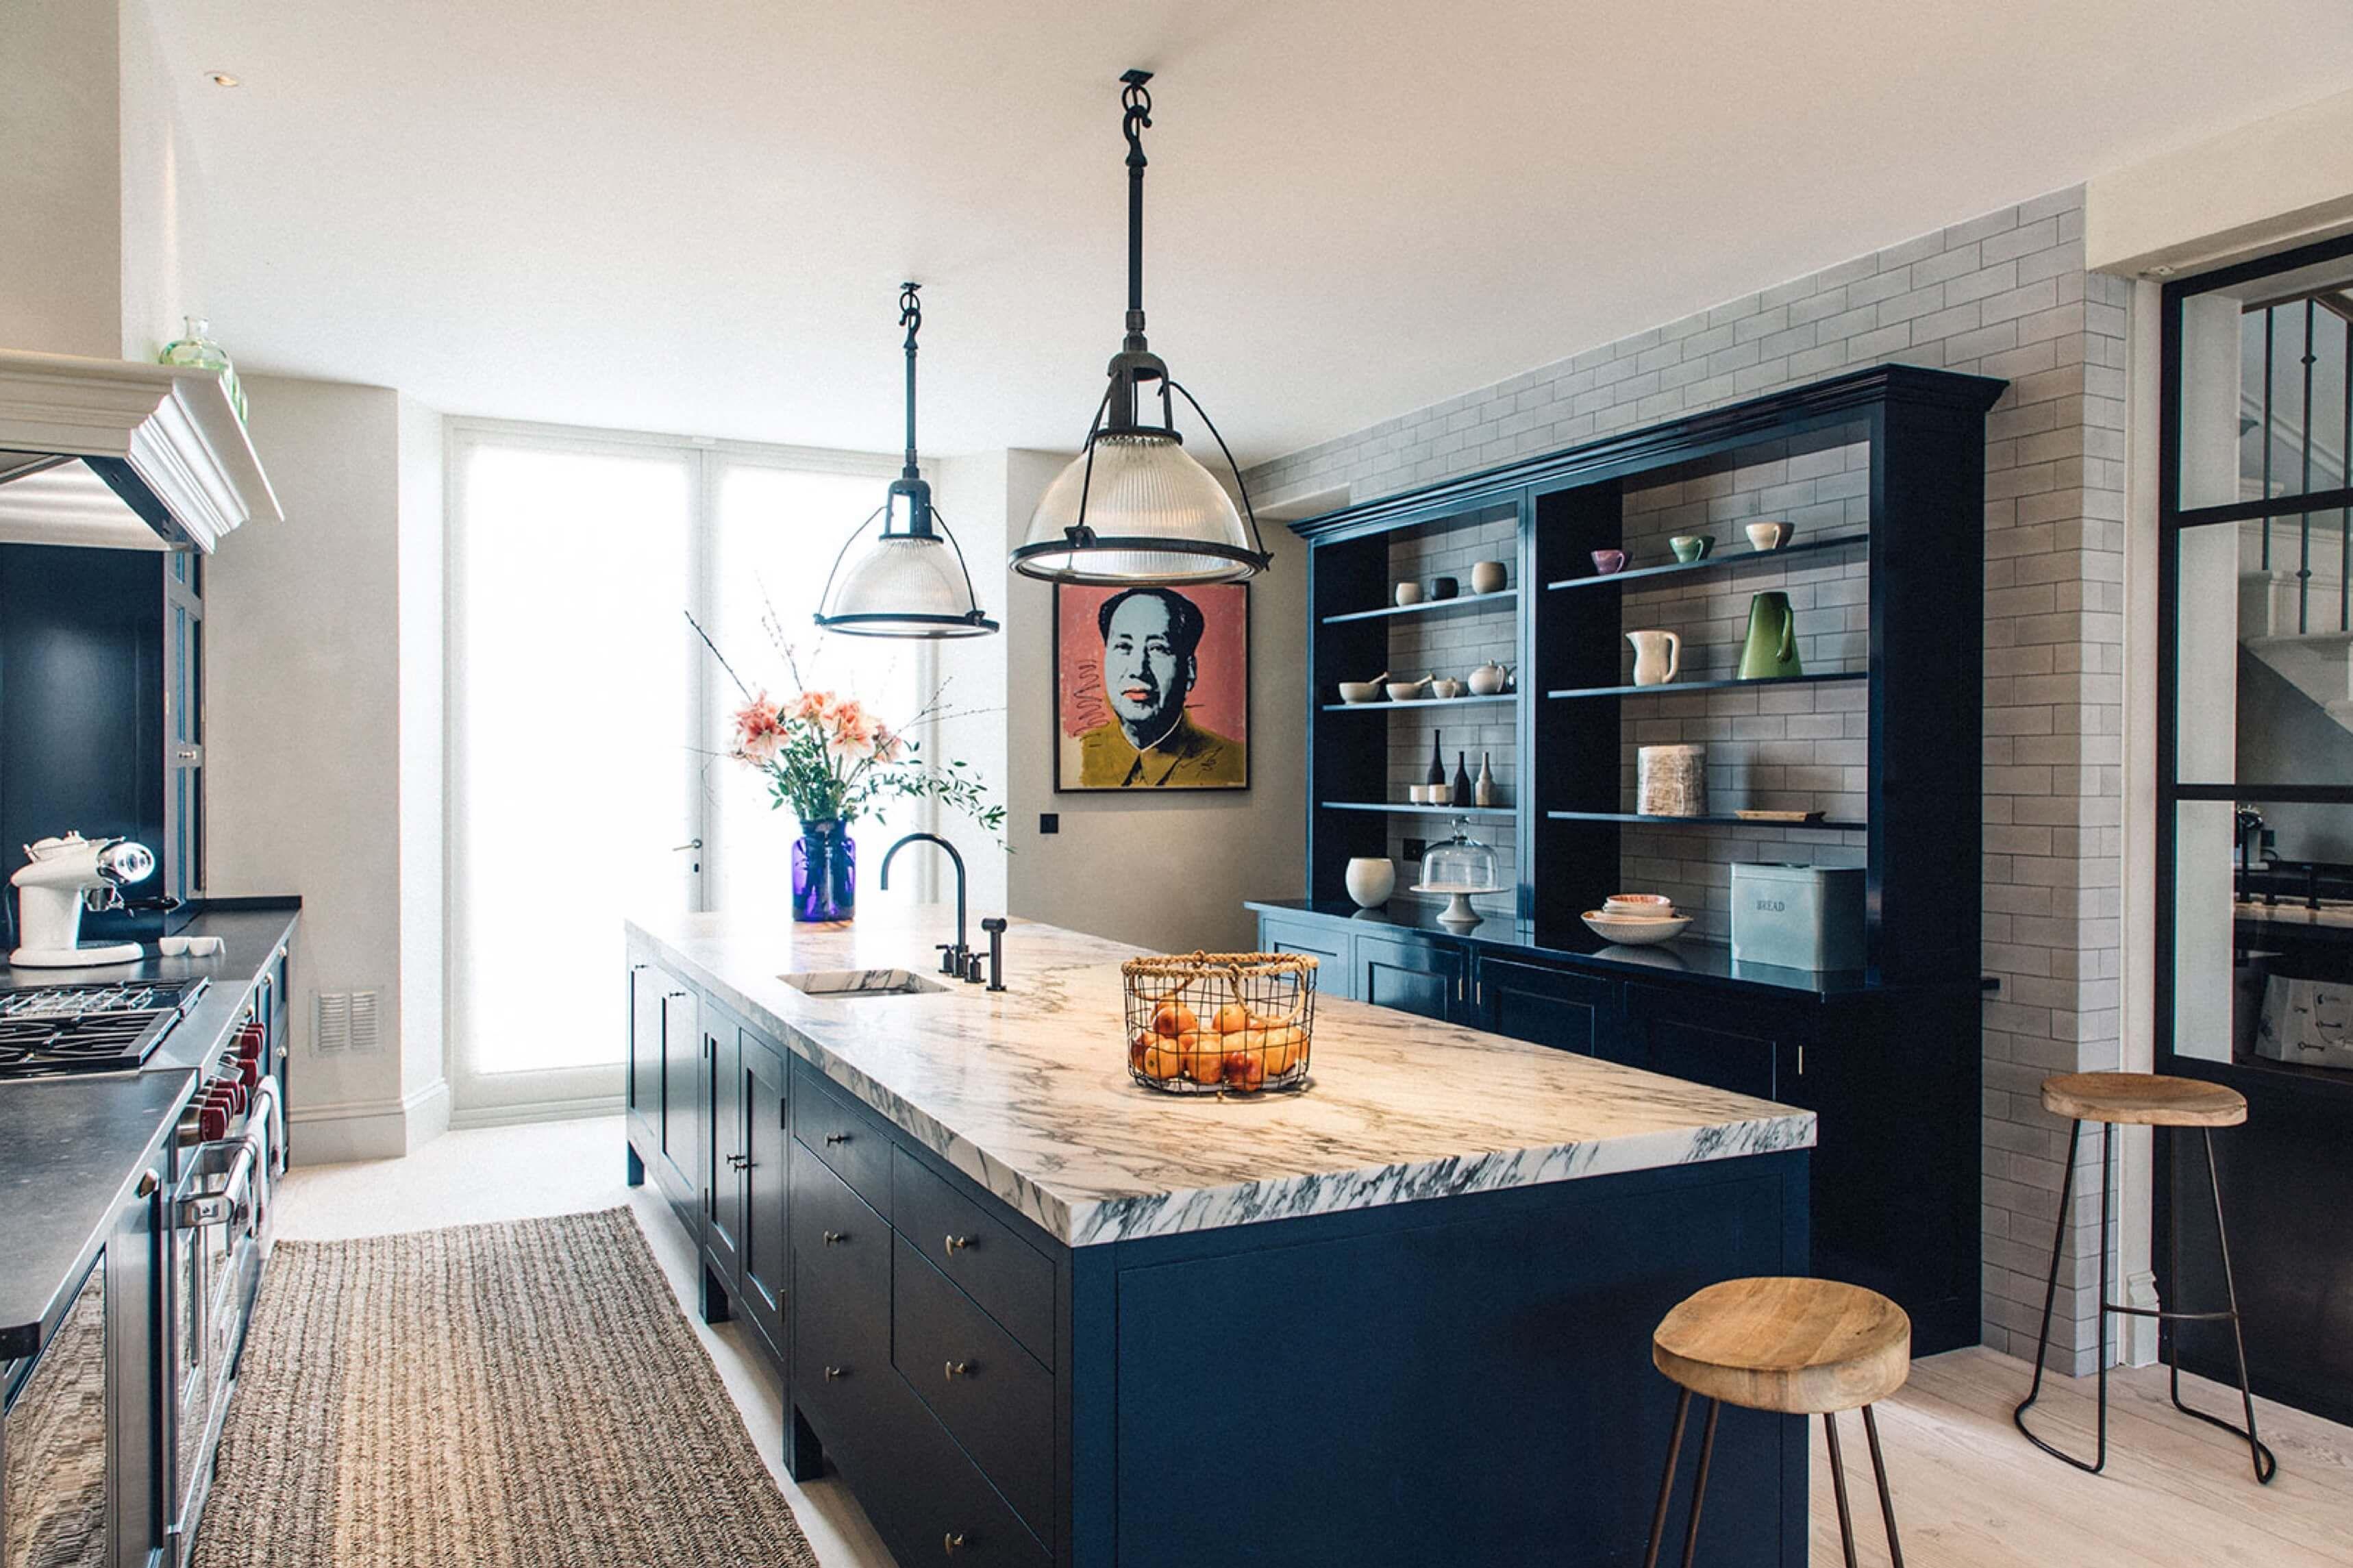 Plain English Kitchen Hammersmith Mews In 2020 English Kitchens Design Plain English Kitchen Kitchen Inspirations